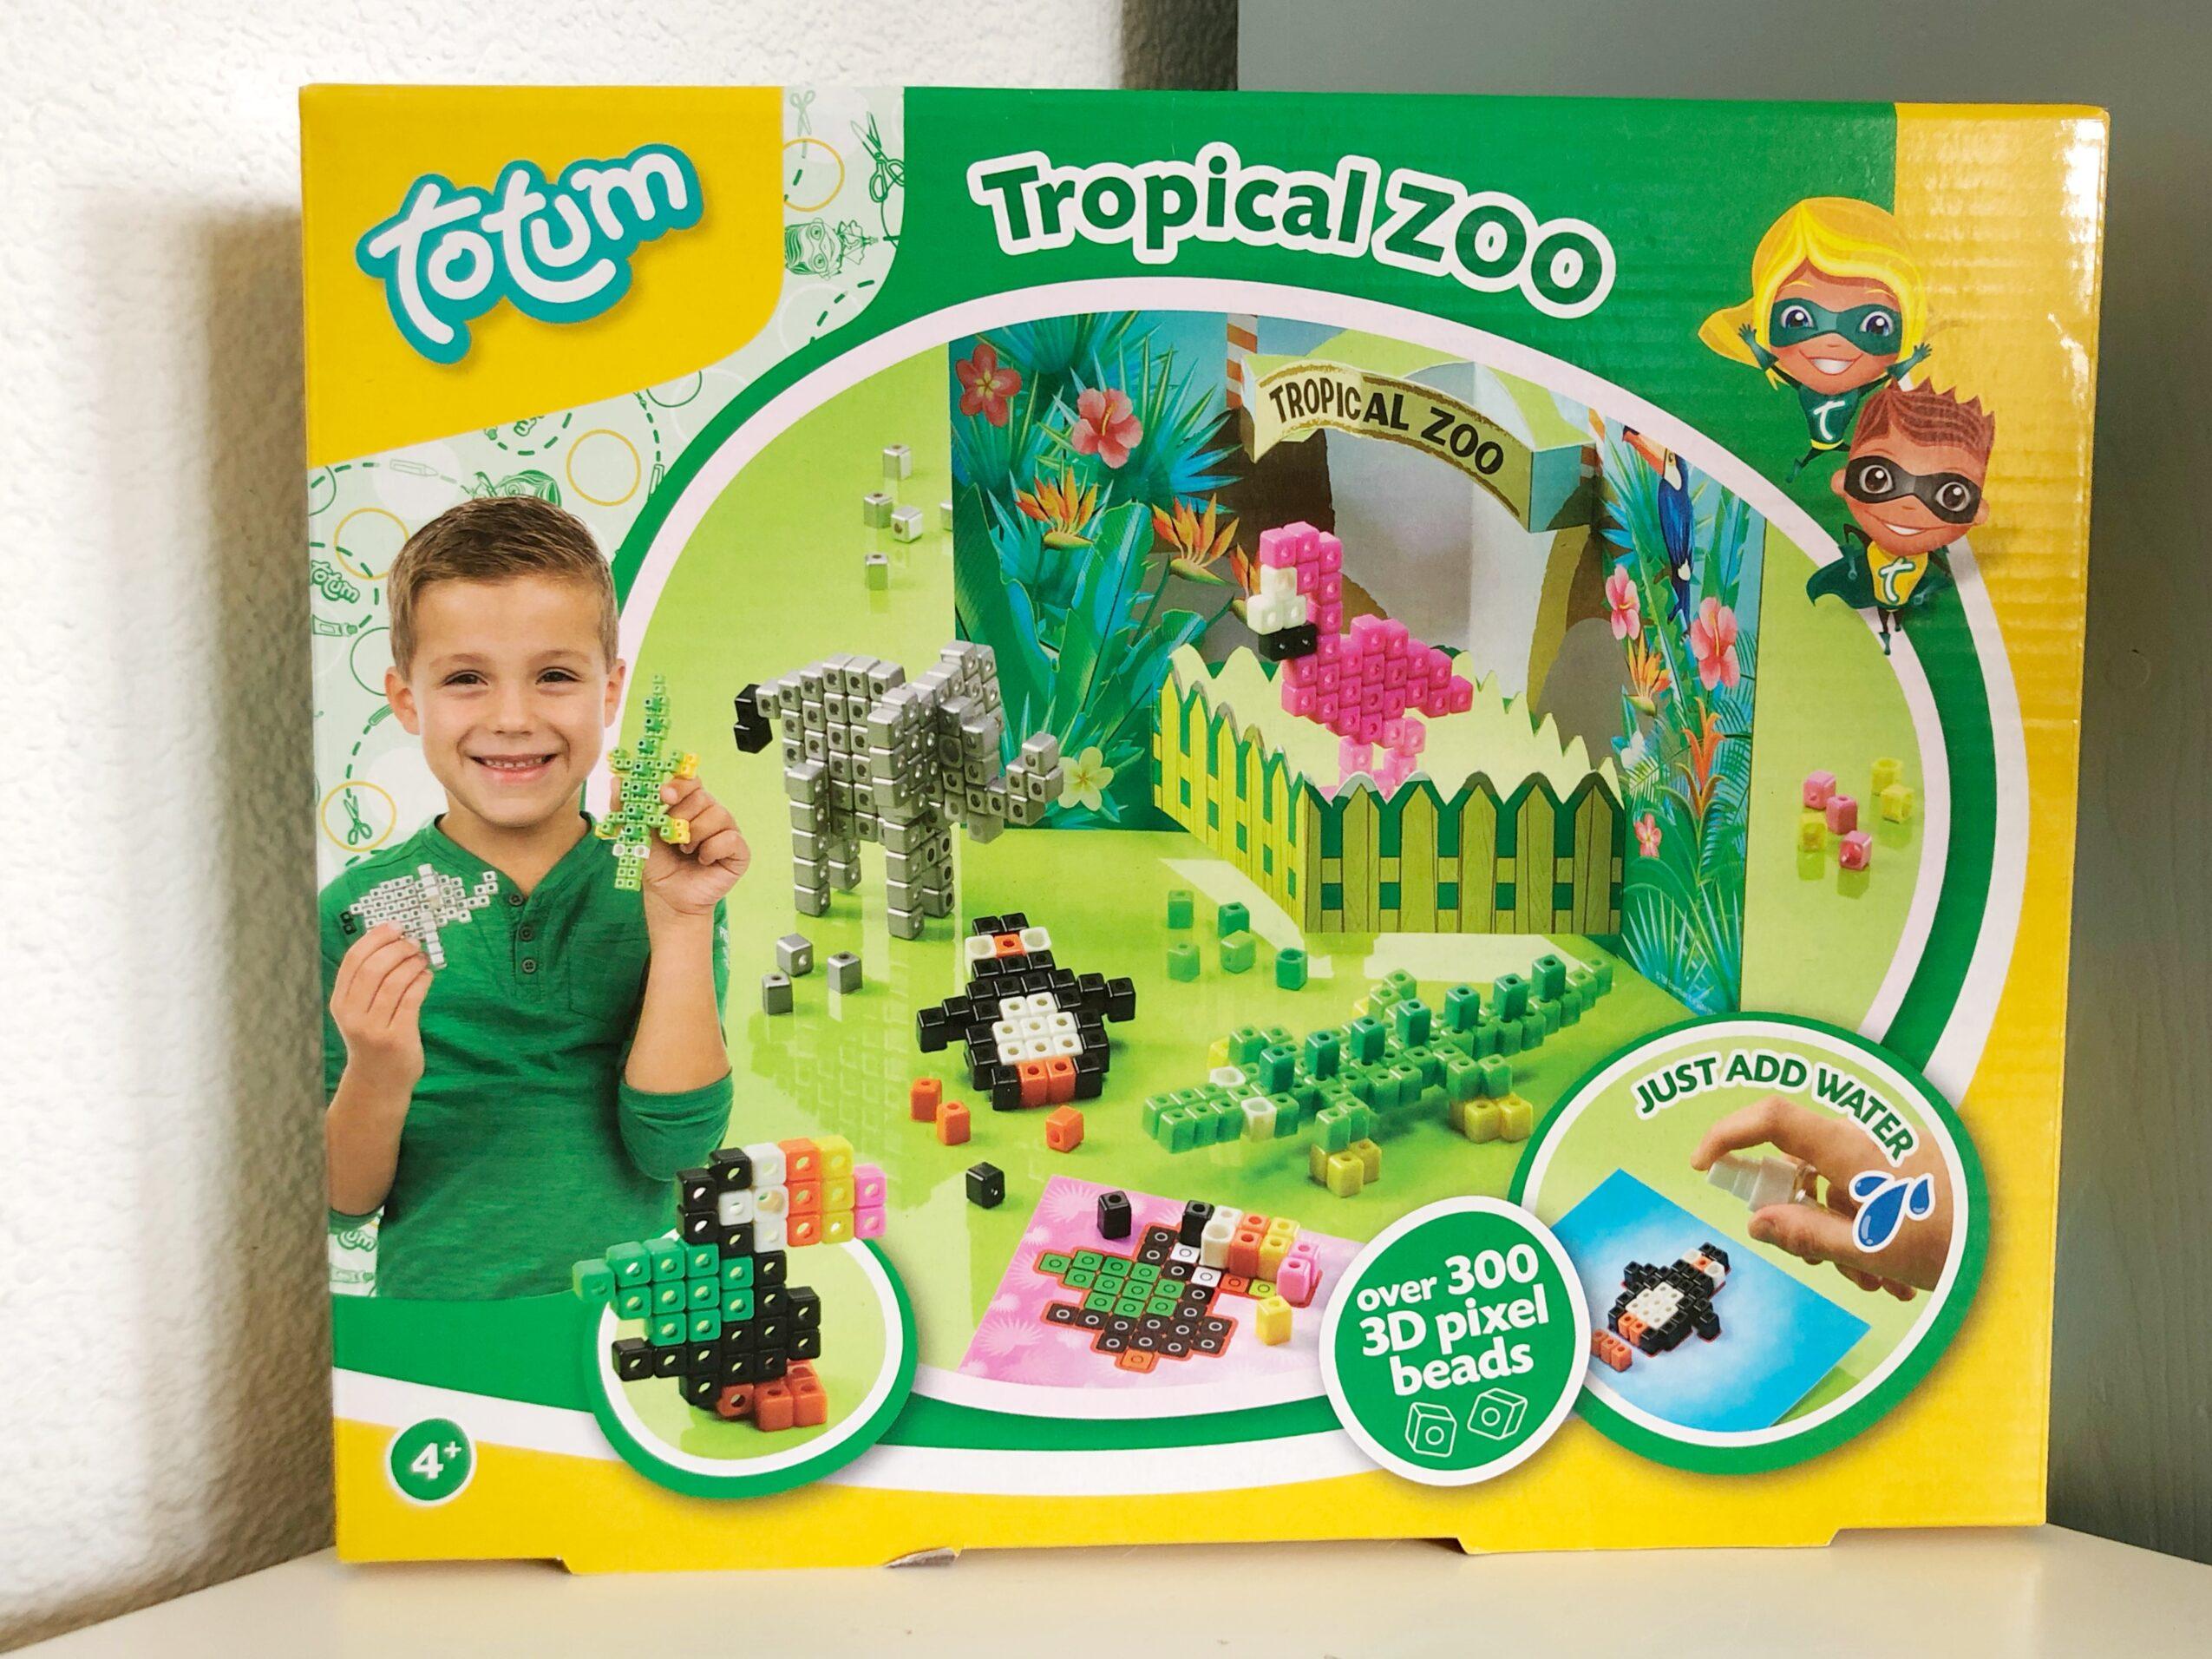 Totum tropical zoo